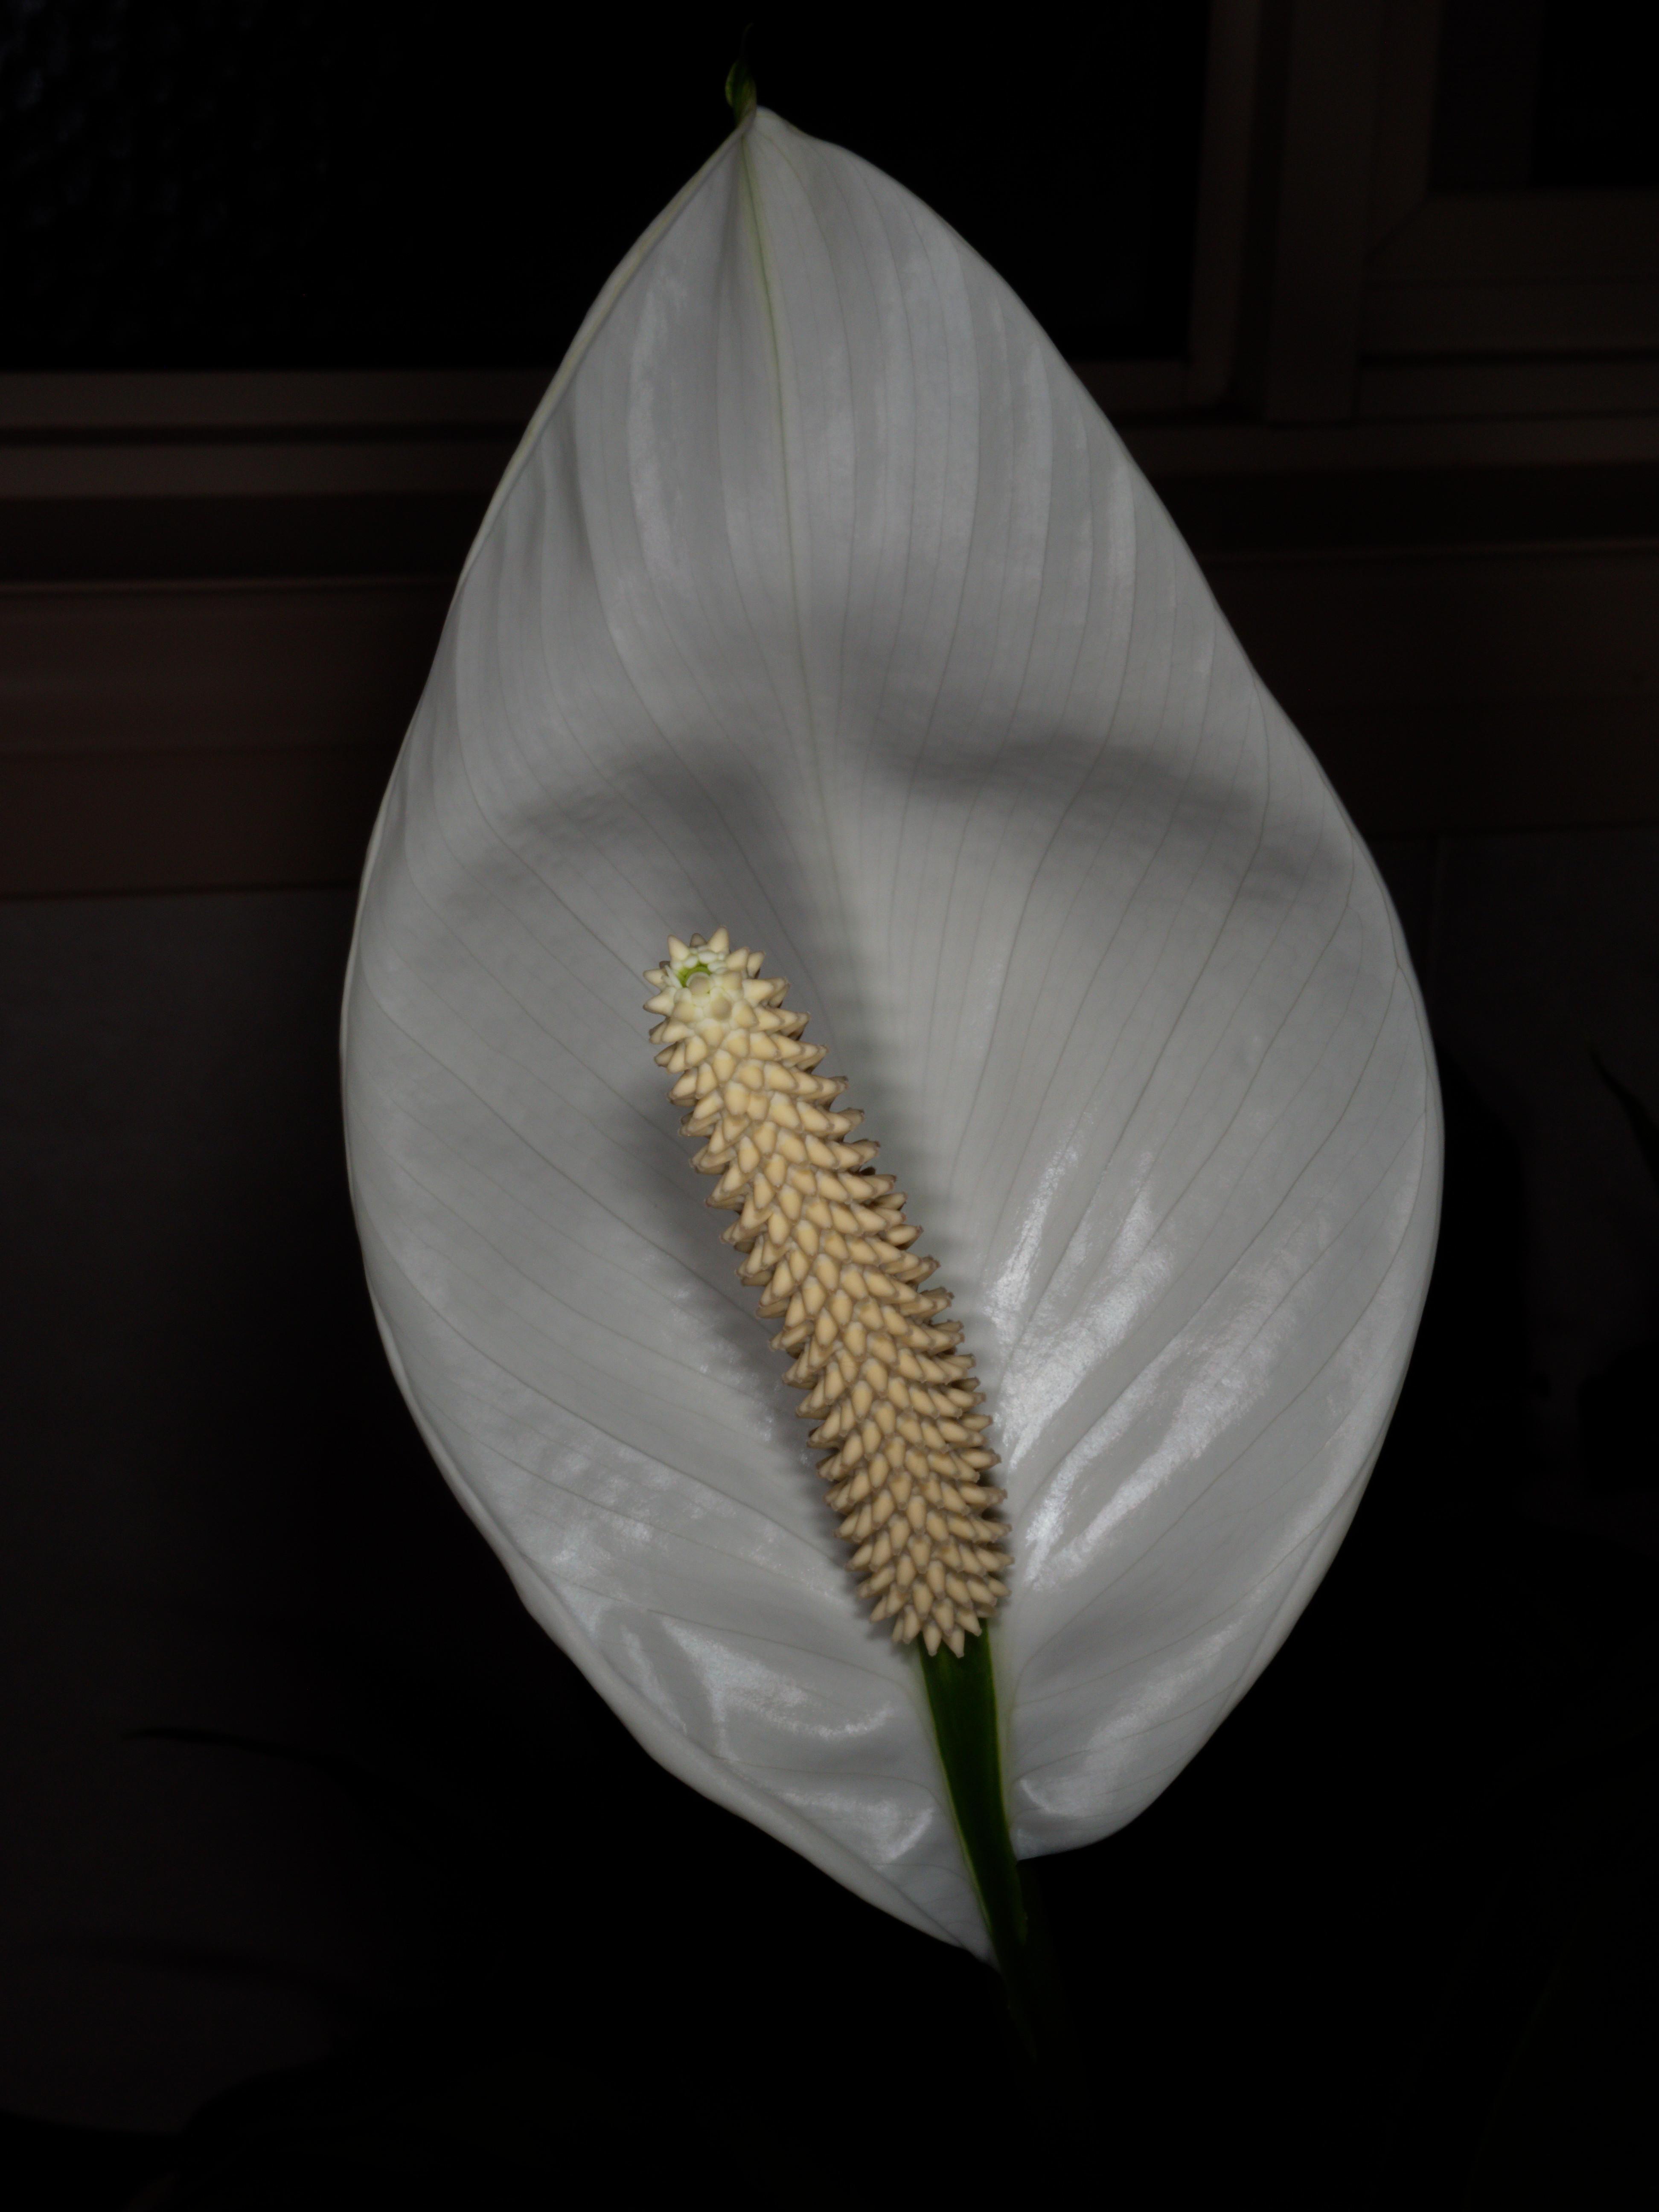 Spathiphyllum-7.jpeg